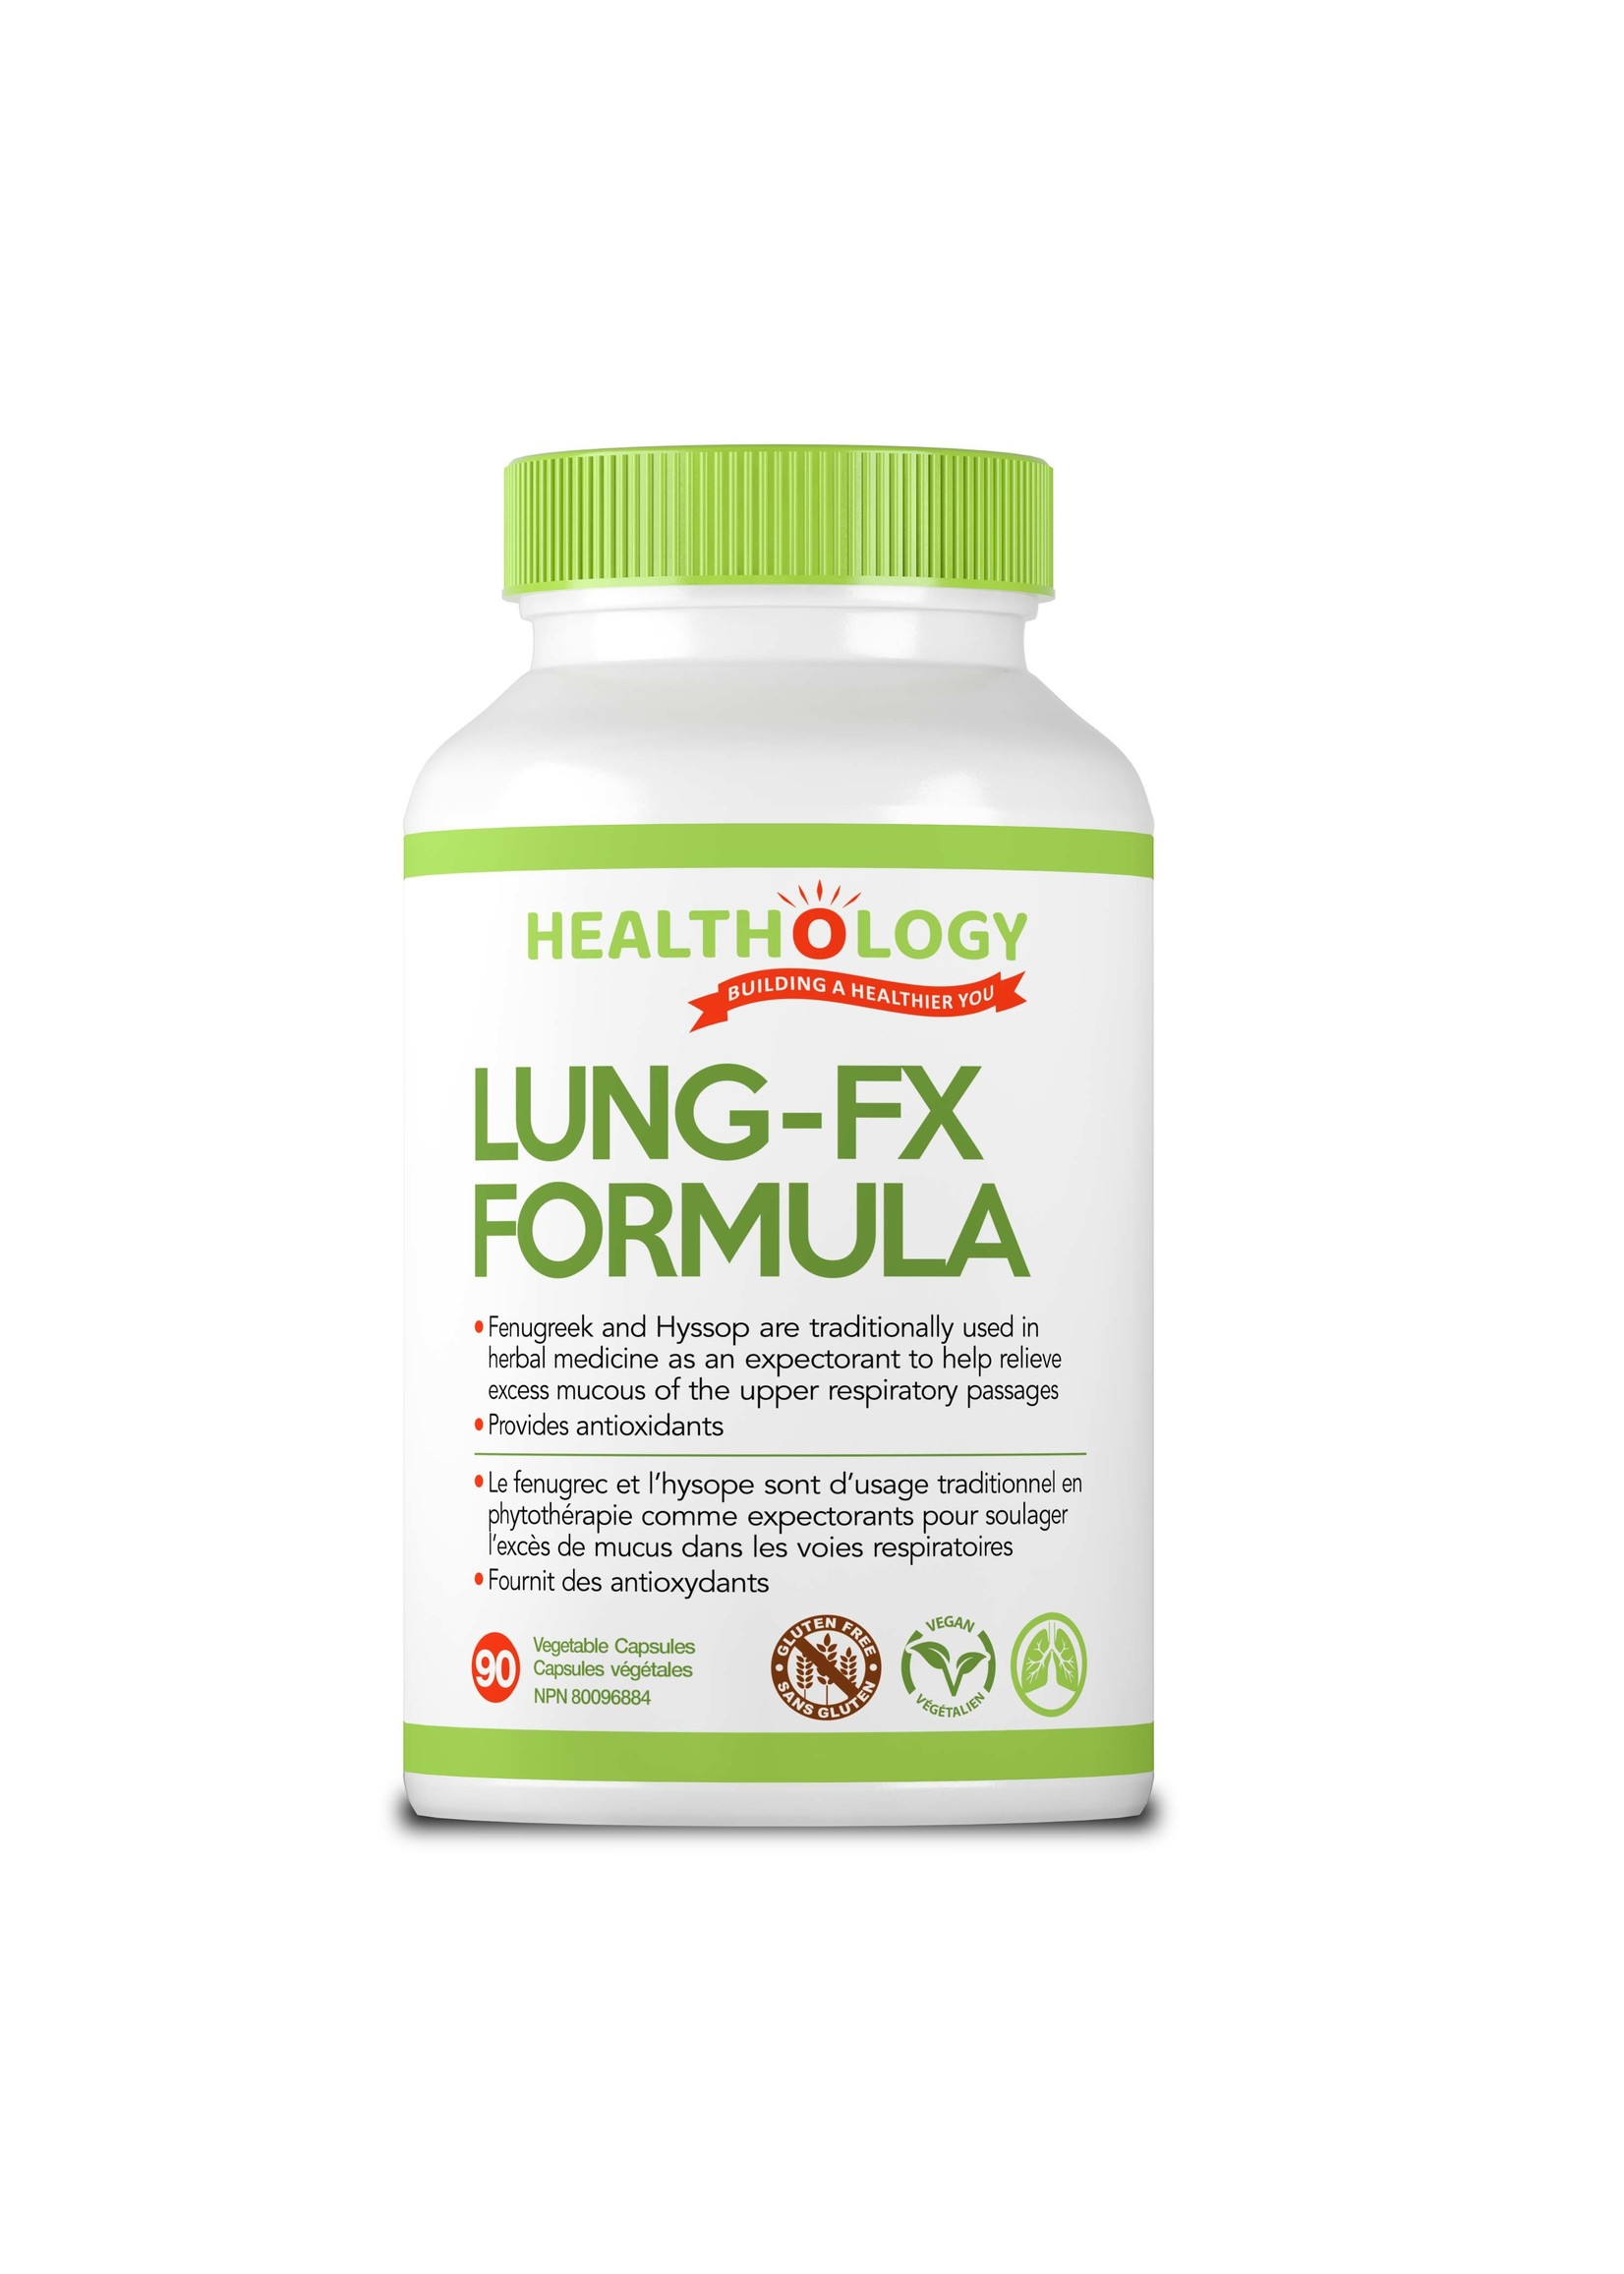 Healthology Healthology LUNG-FX 90 Capsules